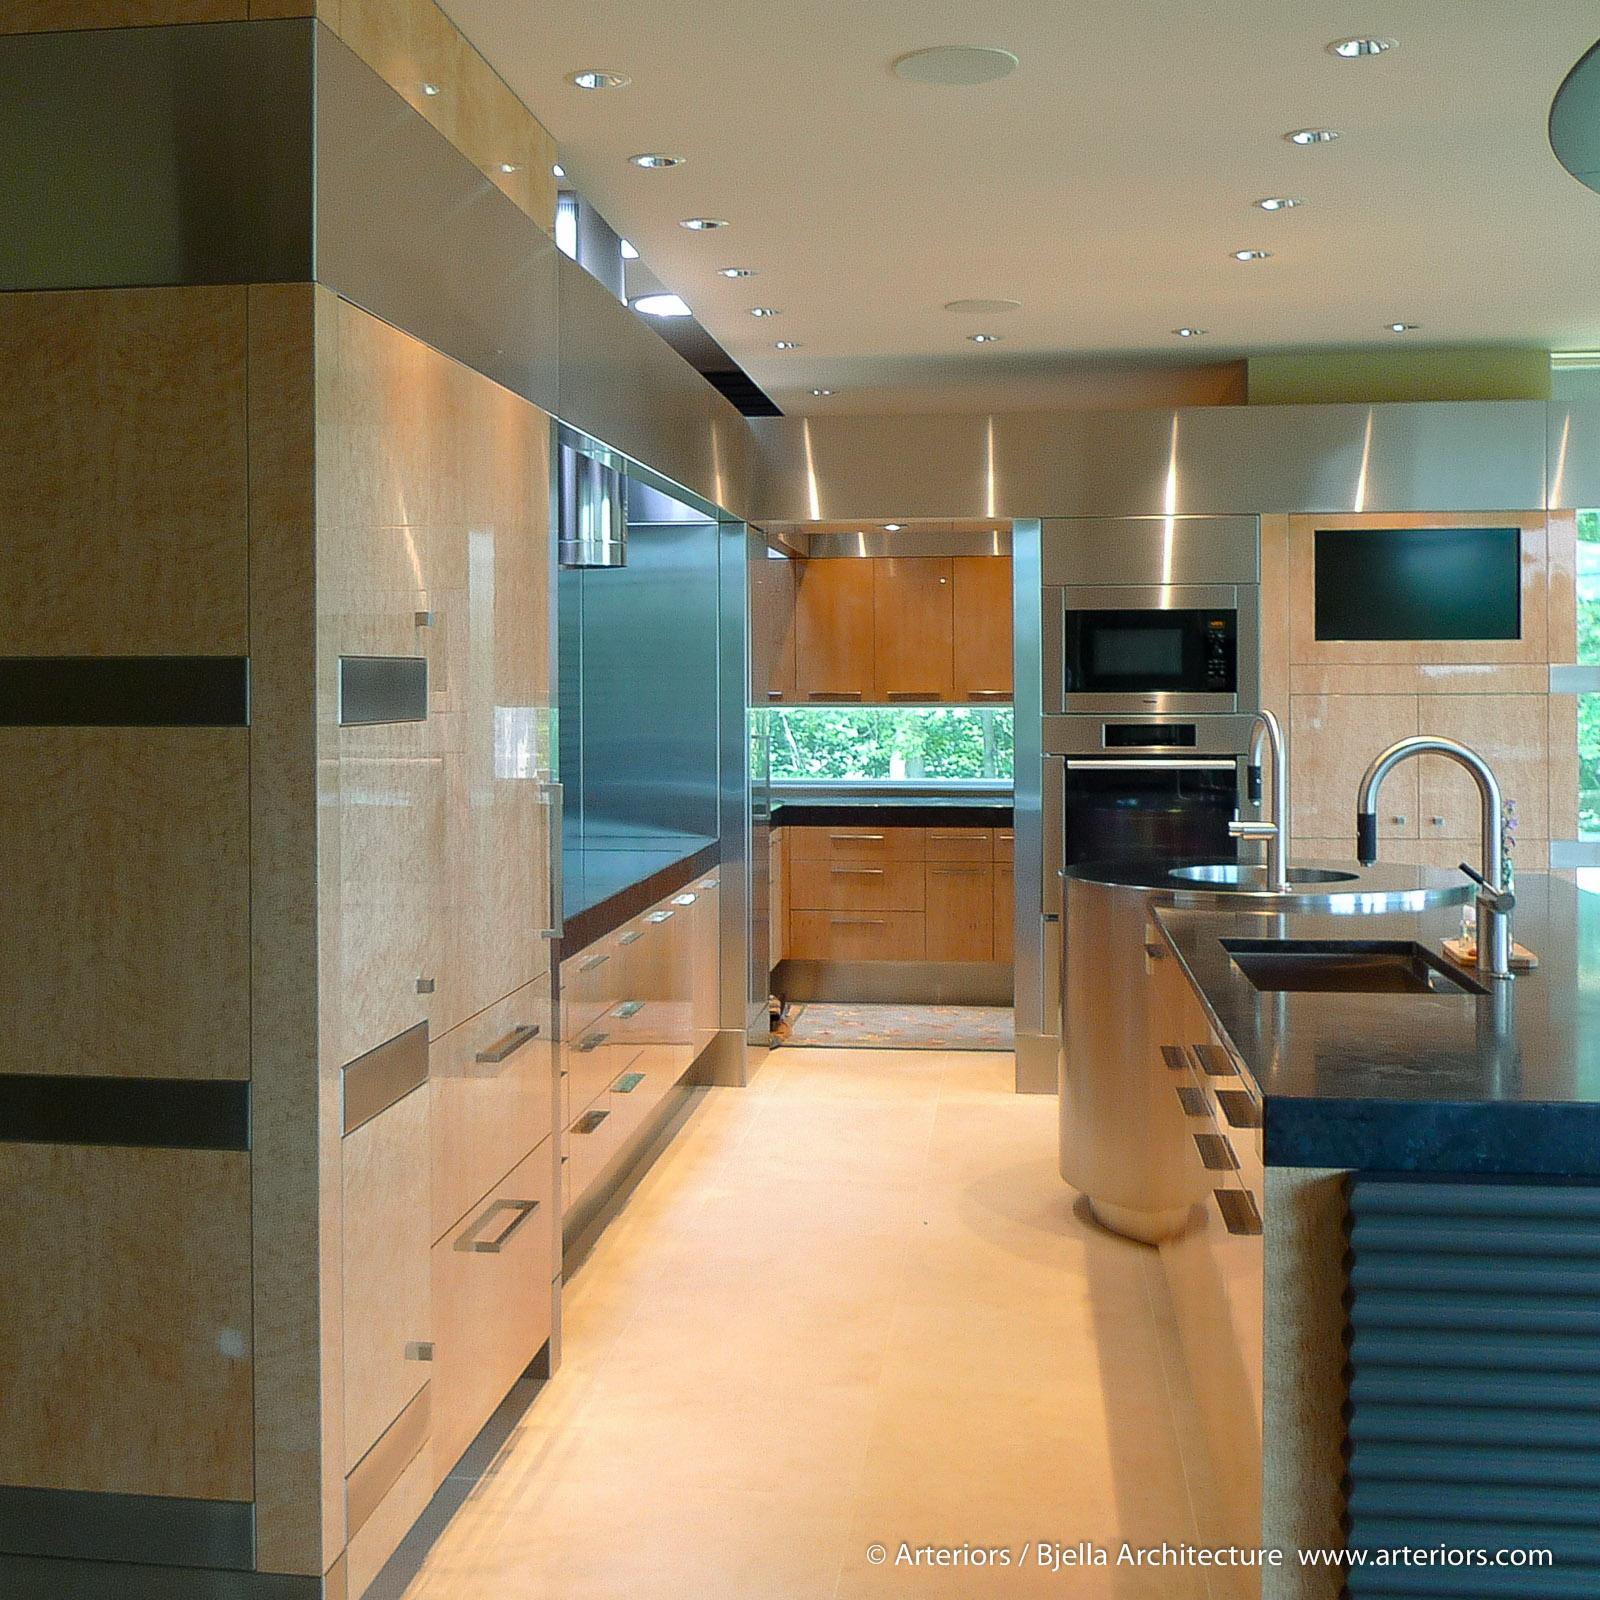 James Bond Kitchen by Tim Bjella - Arteriors-5